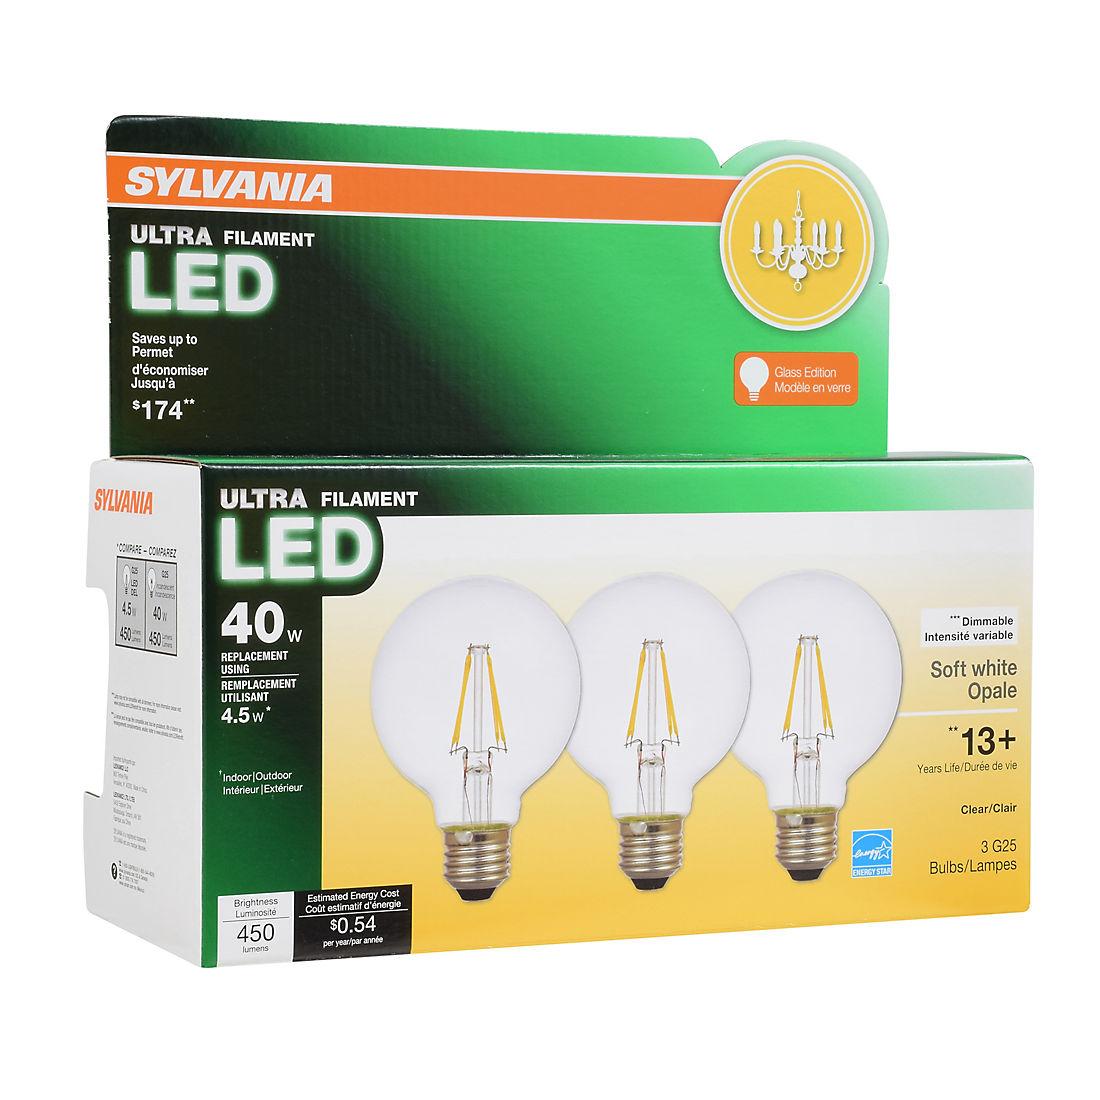 Sylvania 40w Equivalent Led G24 Light Bulbs 3 Pk Soft White